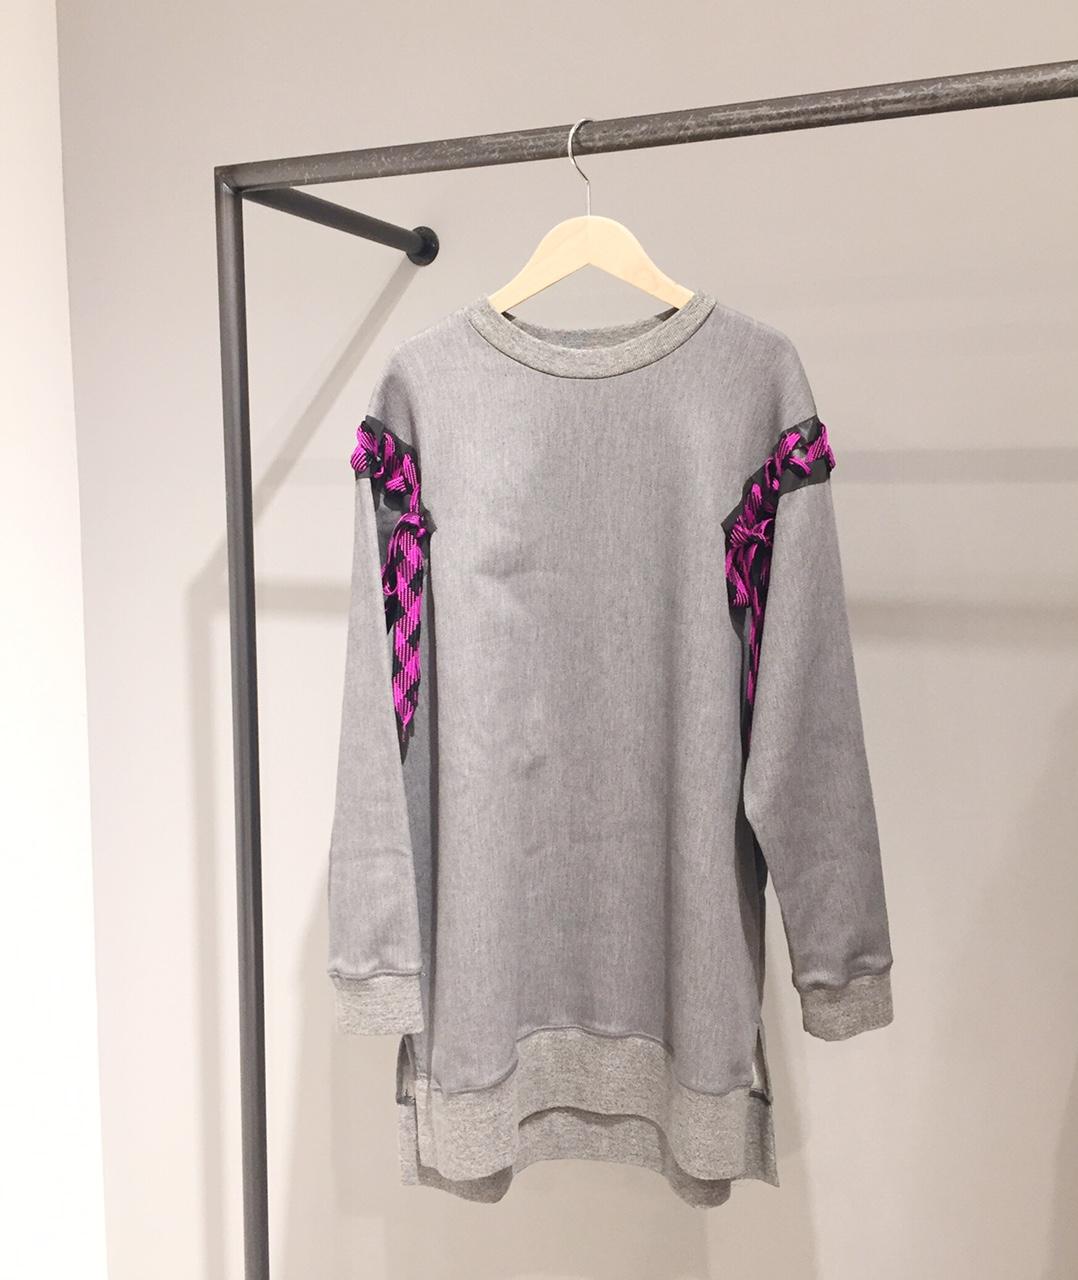 mintdesigns【ミントデザインズ】SLEEVE STRING SWEAT★香川・綾川店